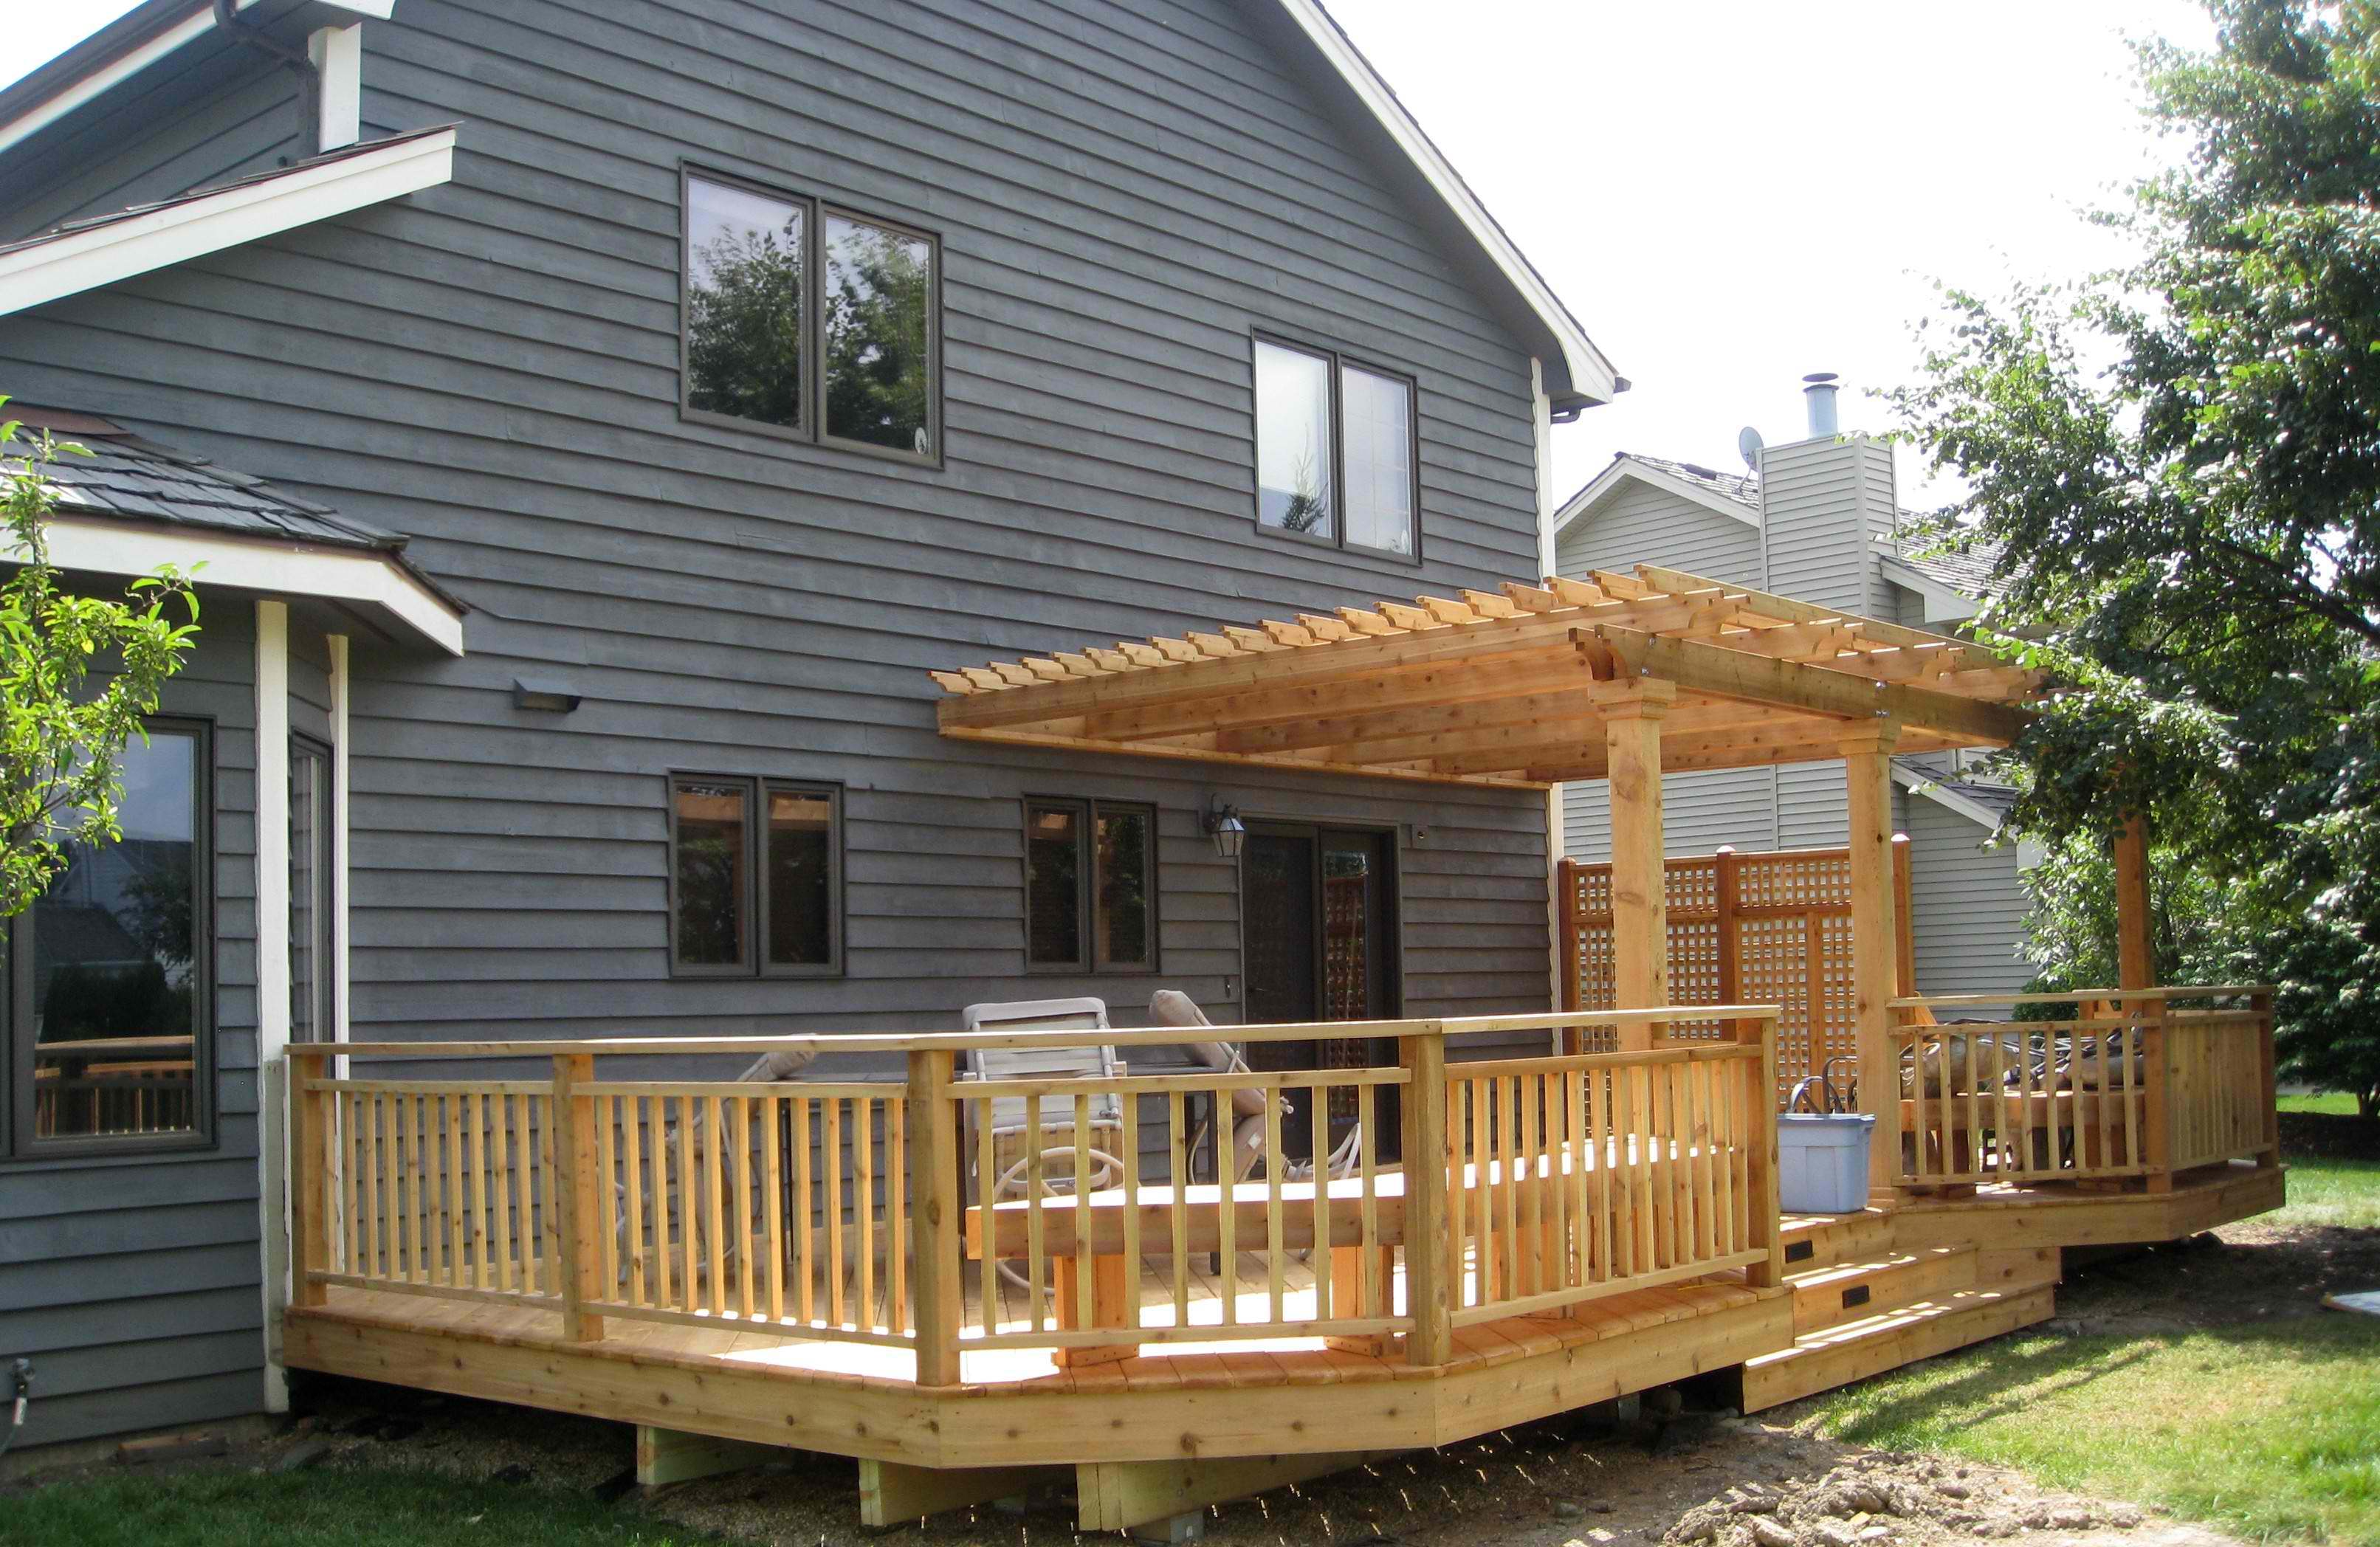 Decks & Light Construction Projects | Winston Salem ... on Deck Over Patio Ideas id=86952